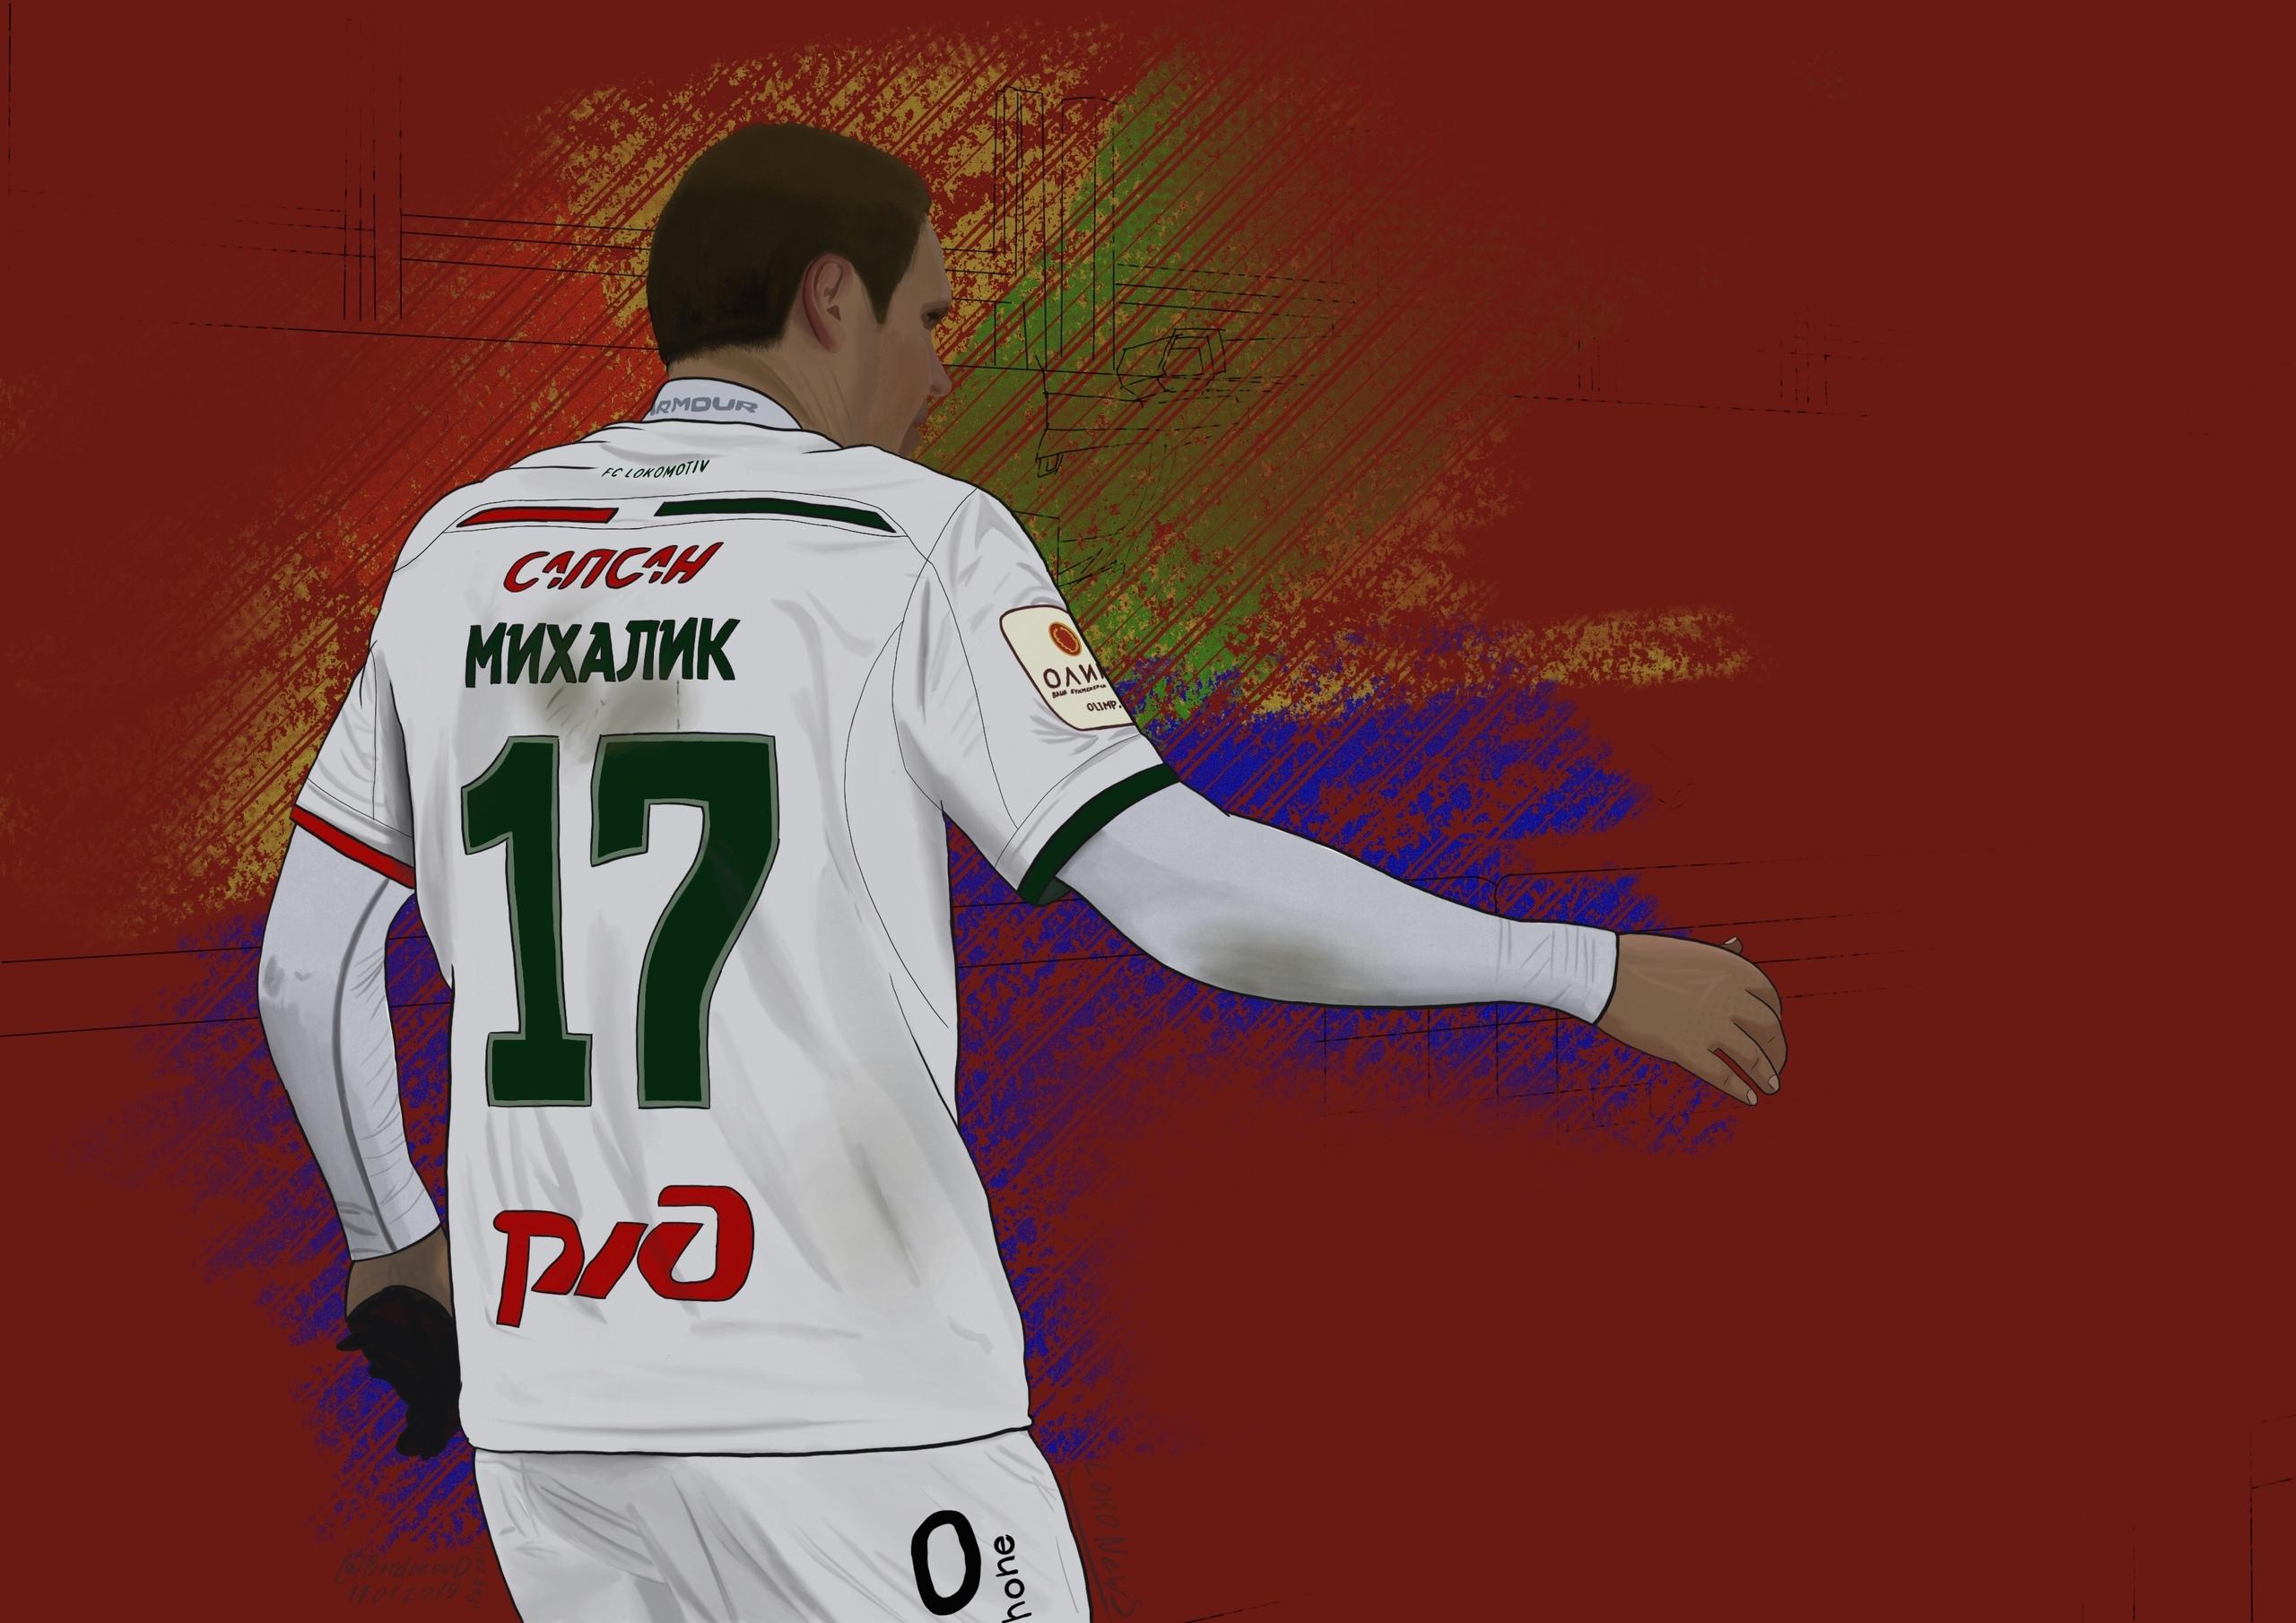 Тарас Михалик. Рисунок: Дмитрий Бурдонов